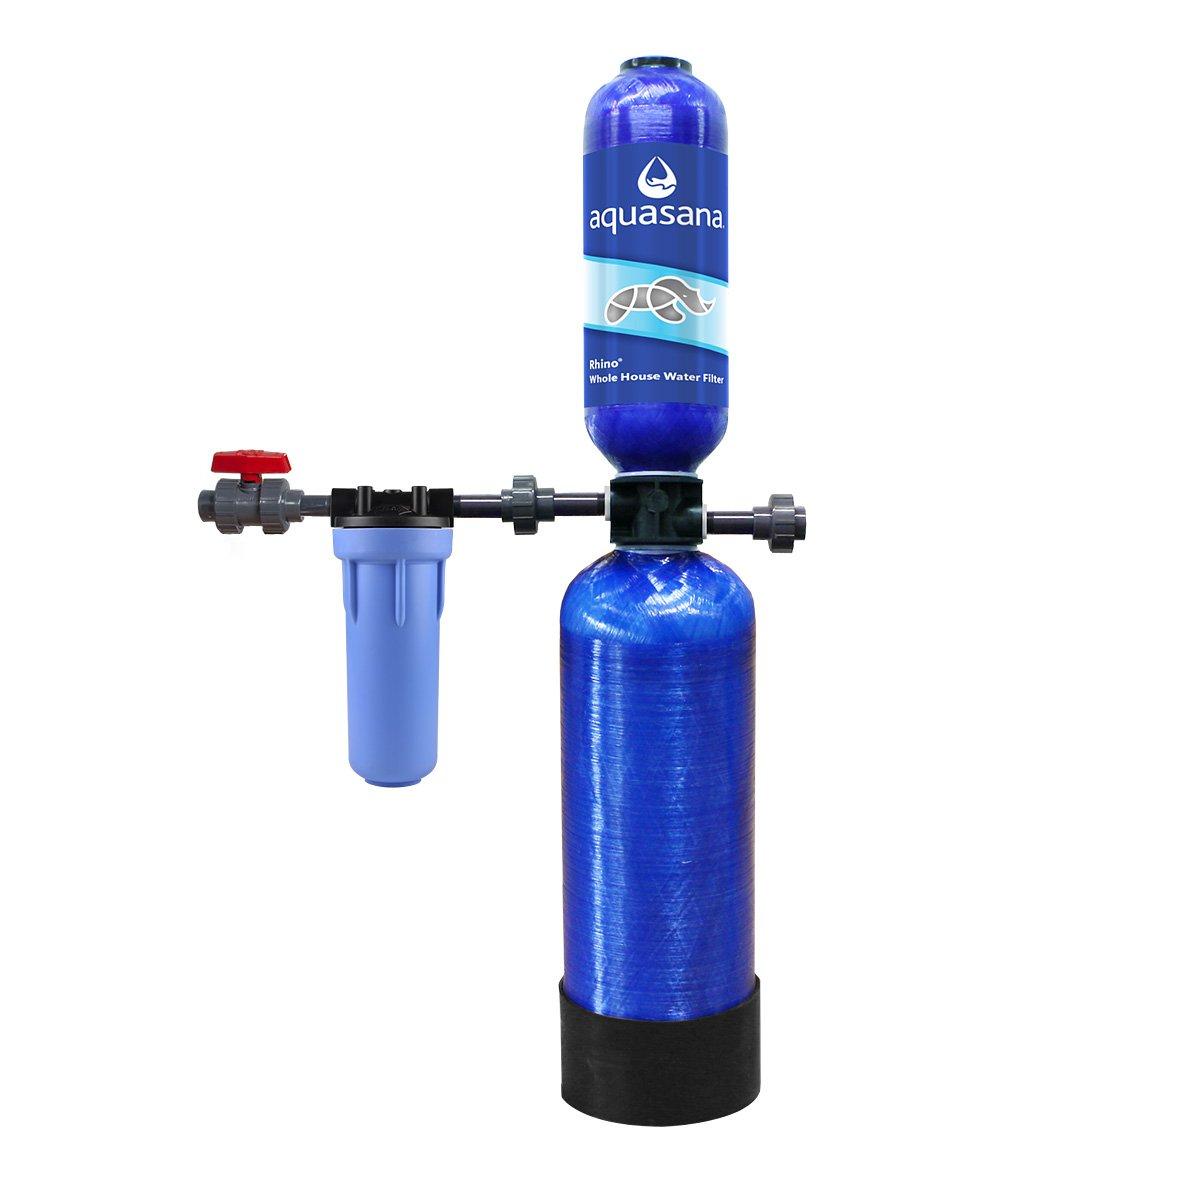 Aquasana EQ-300 Rhino 3-Year, 300,000 Gallon Whole House Water Filter